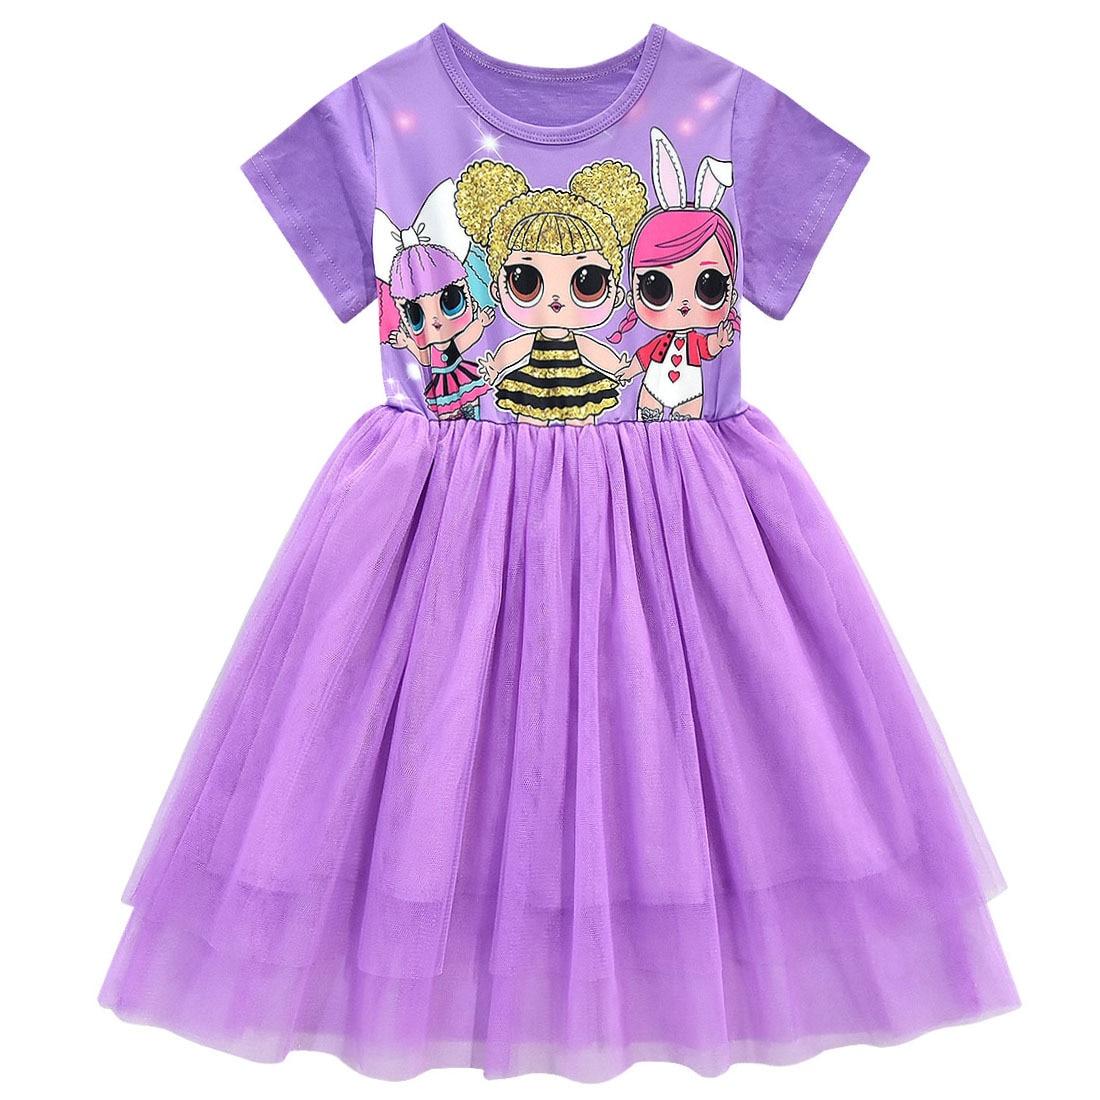 Girls Lol Dress Toddler Baby Lol Doll Clothes Kids Cartoon Print Princess Dress Children Short Sleeve Birthday Vestido for Girl 1